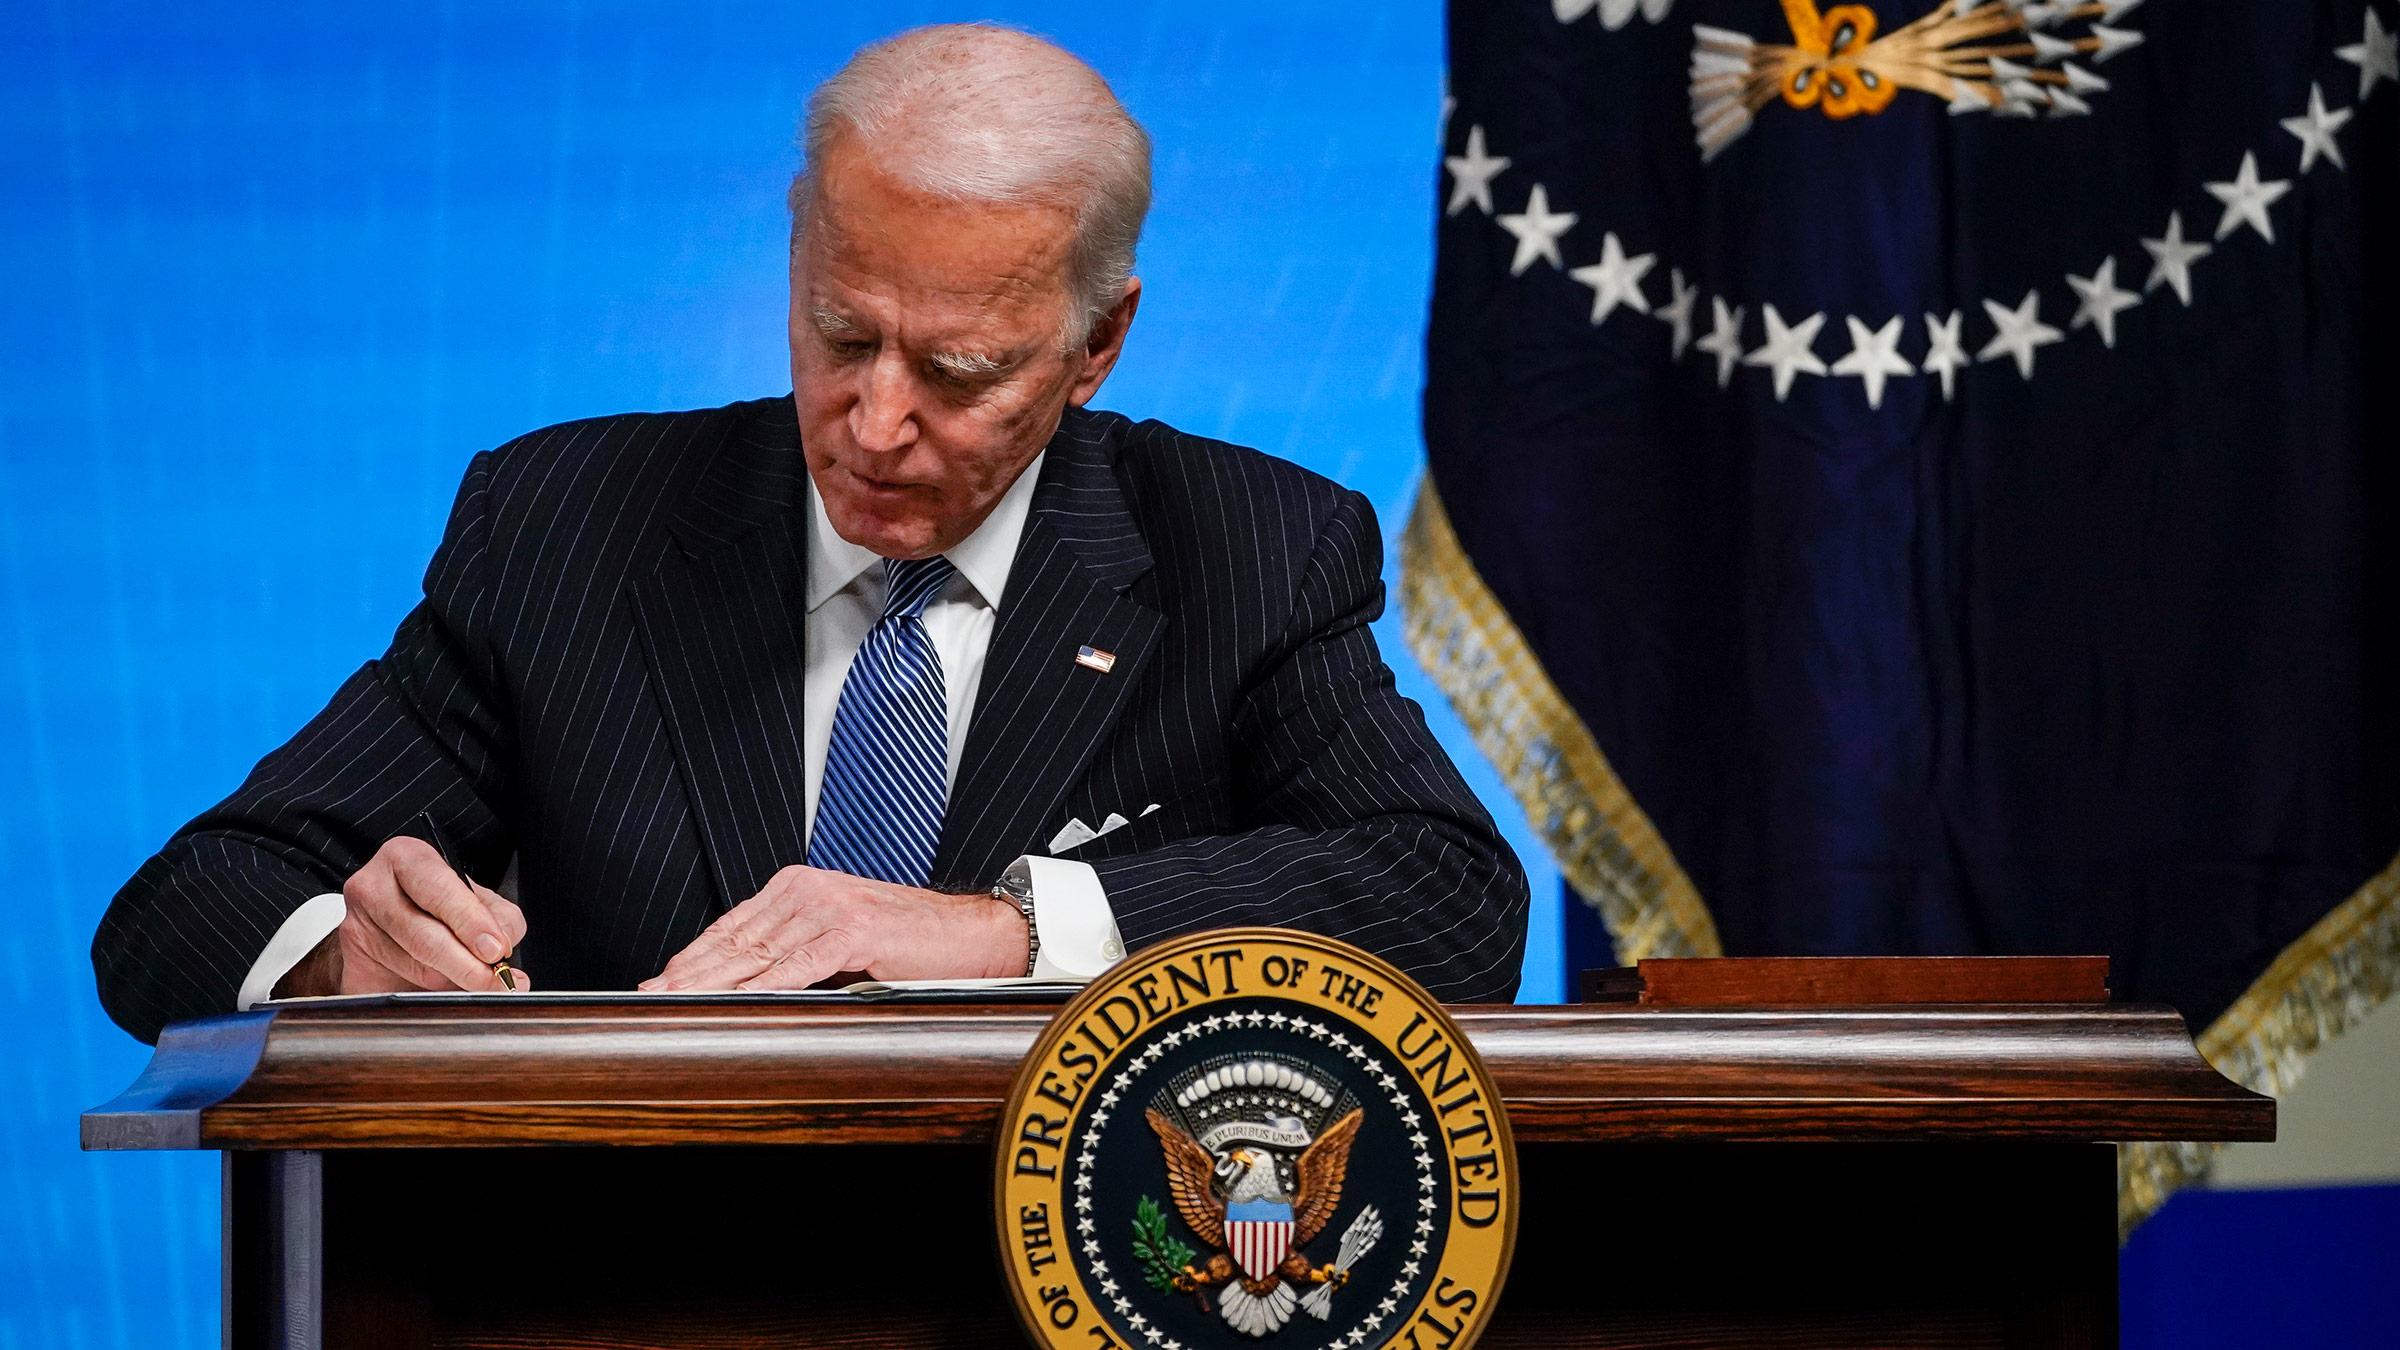 President Joe Biden signs an executive order on Monday, January 25, in Washington, DC.